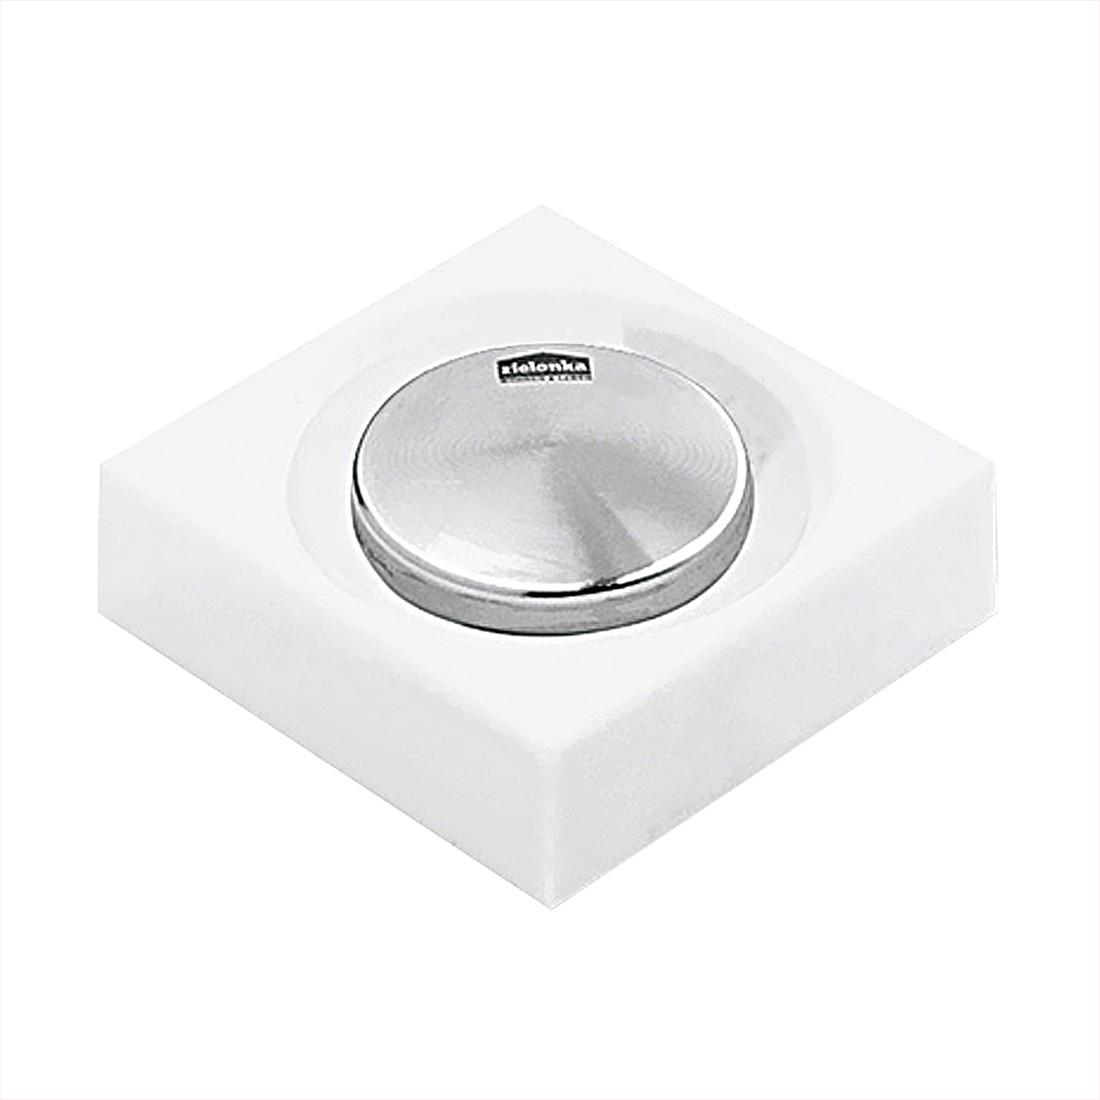 Geruchskiller Ziloclassic – Kautschuk, Edelstahl Weiß-Silber, Zielonka bestellen